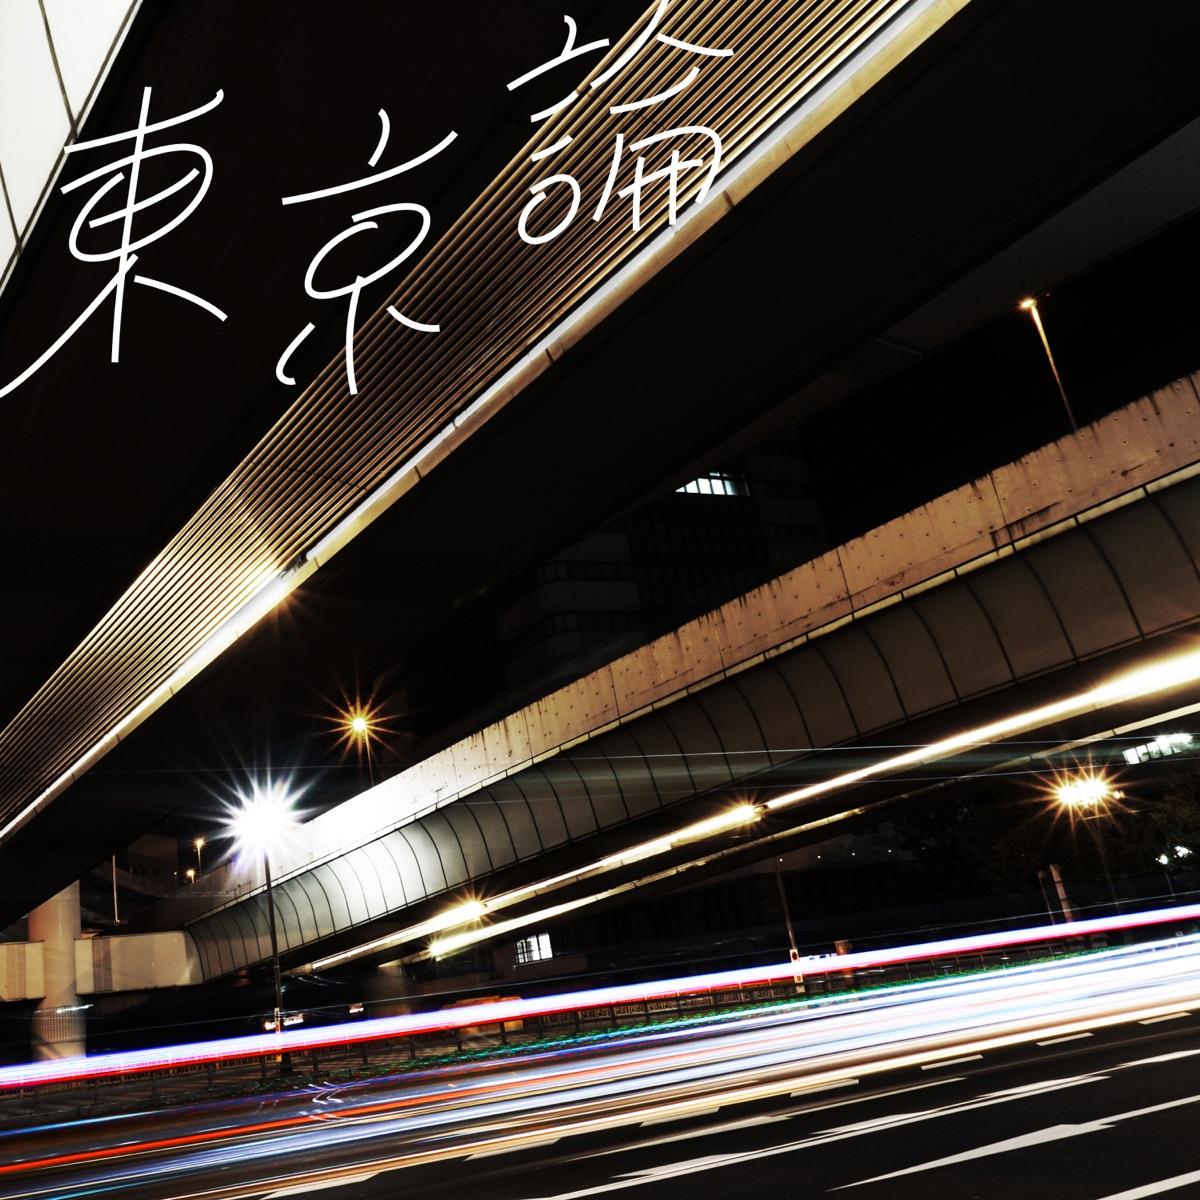 『RAM RIDER - 東京論』収録の『東京論』ジャケット